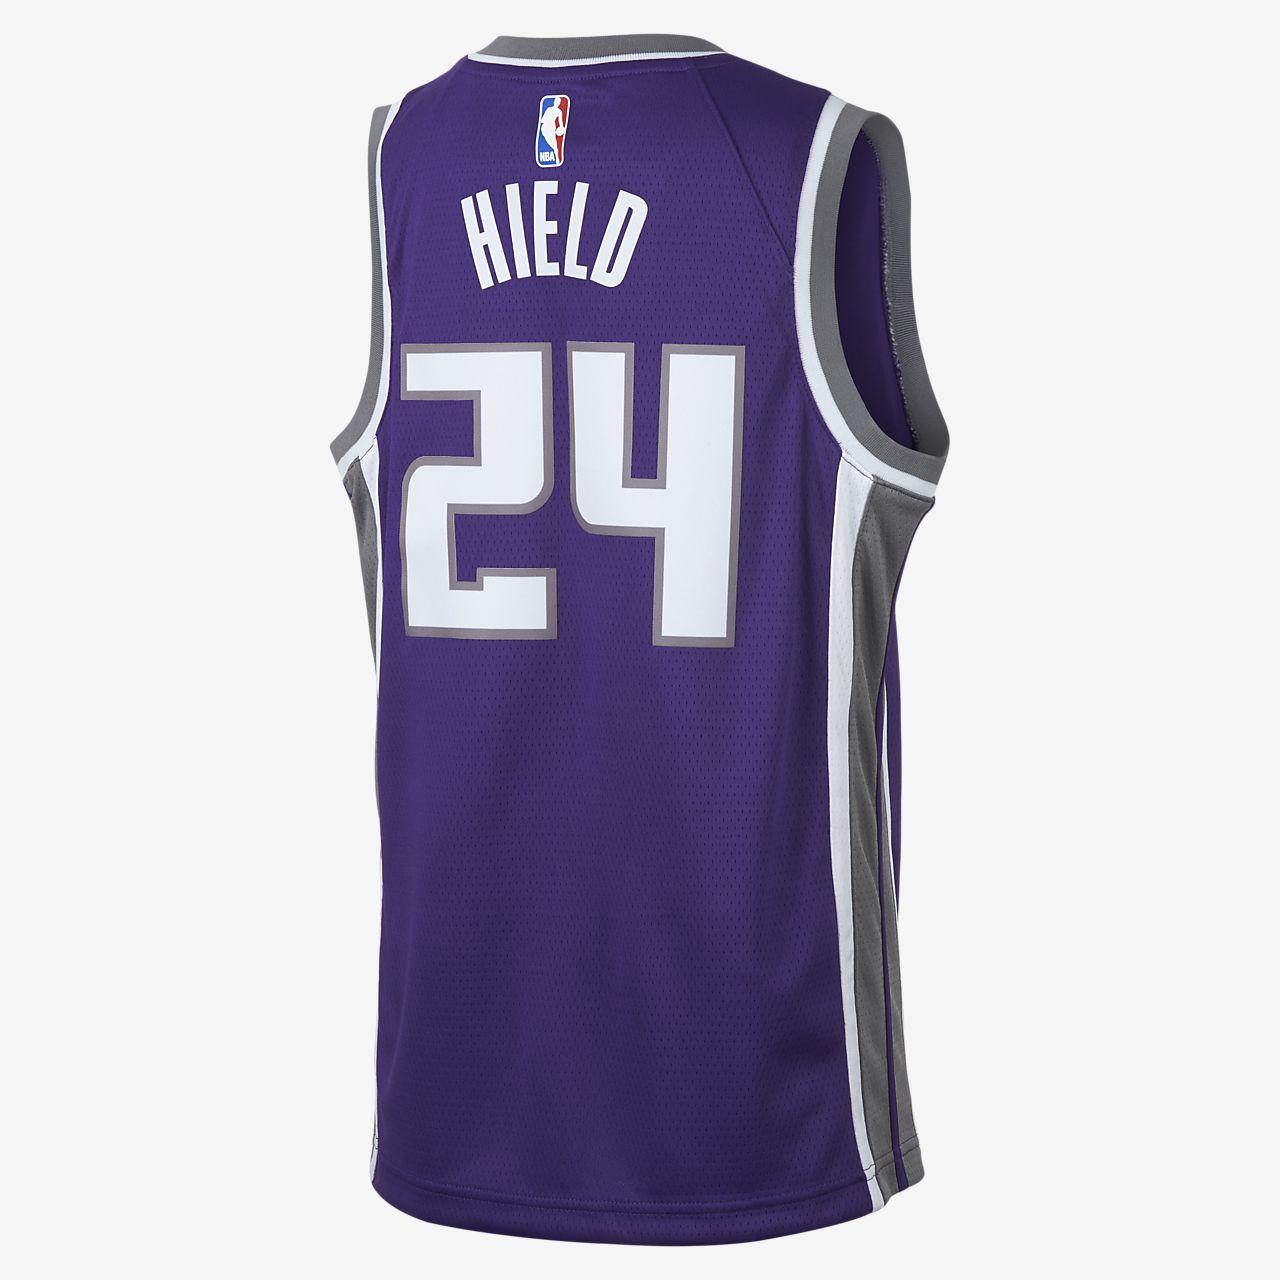 93c7d9fed ... Buddy Hield Sacramento Kings Nike Icon Edition Swingman Big Kids  NBA  Jersey